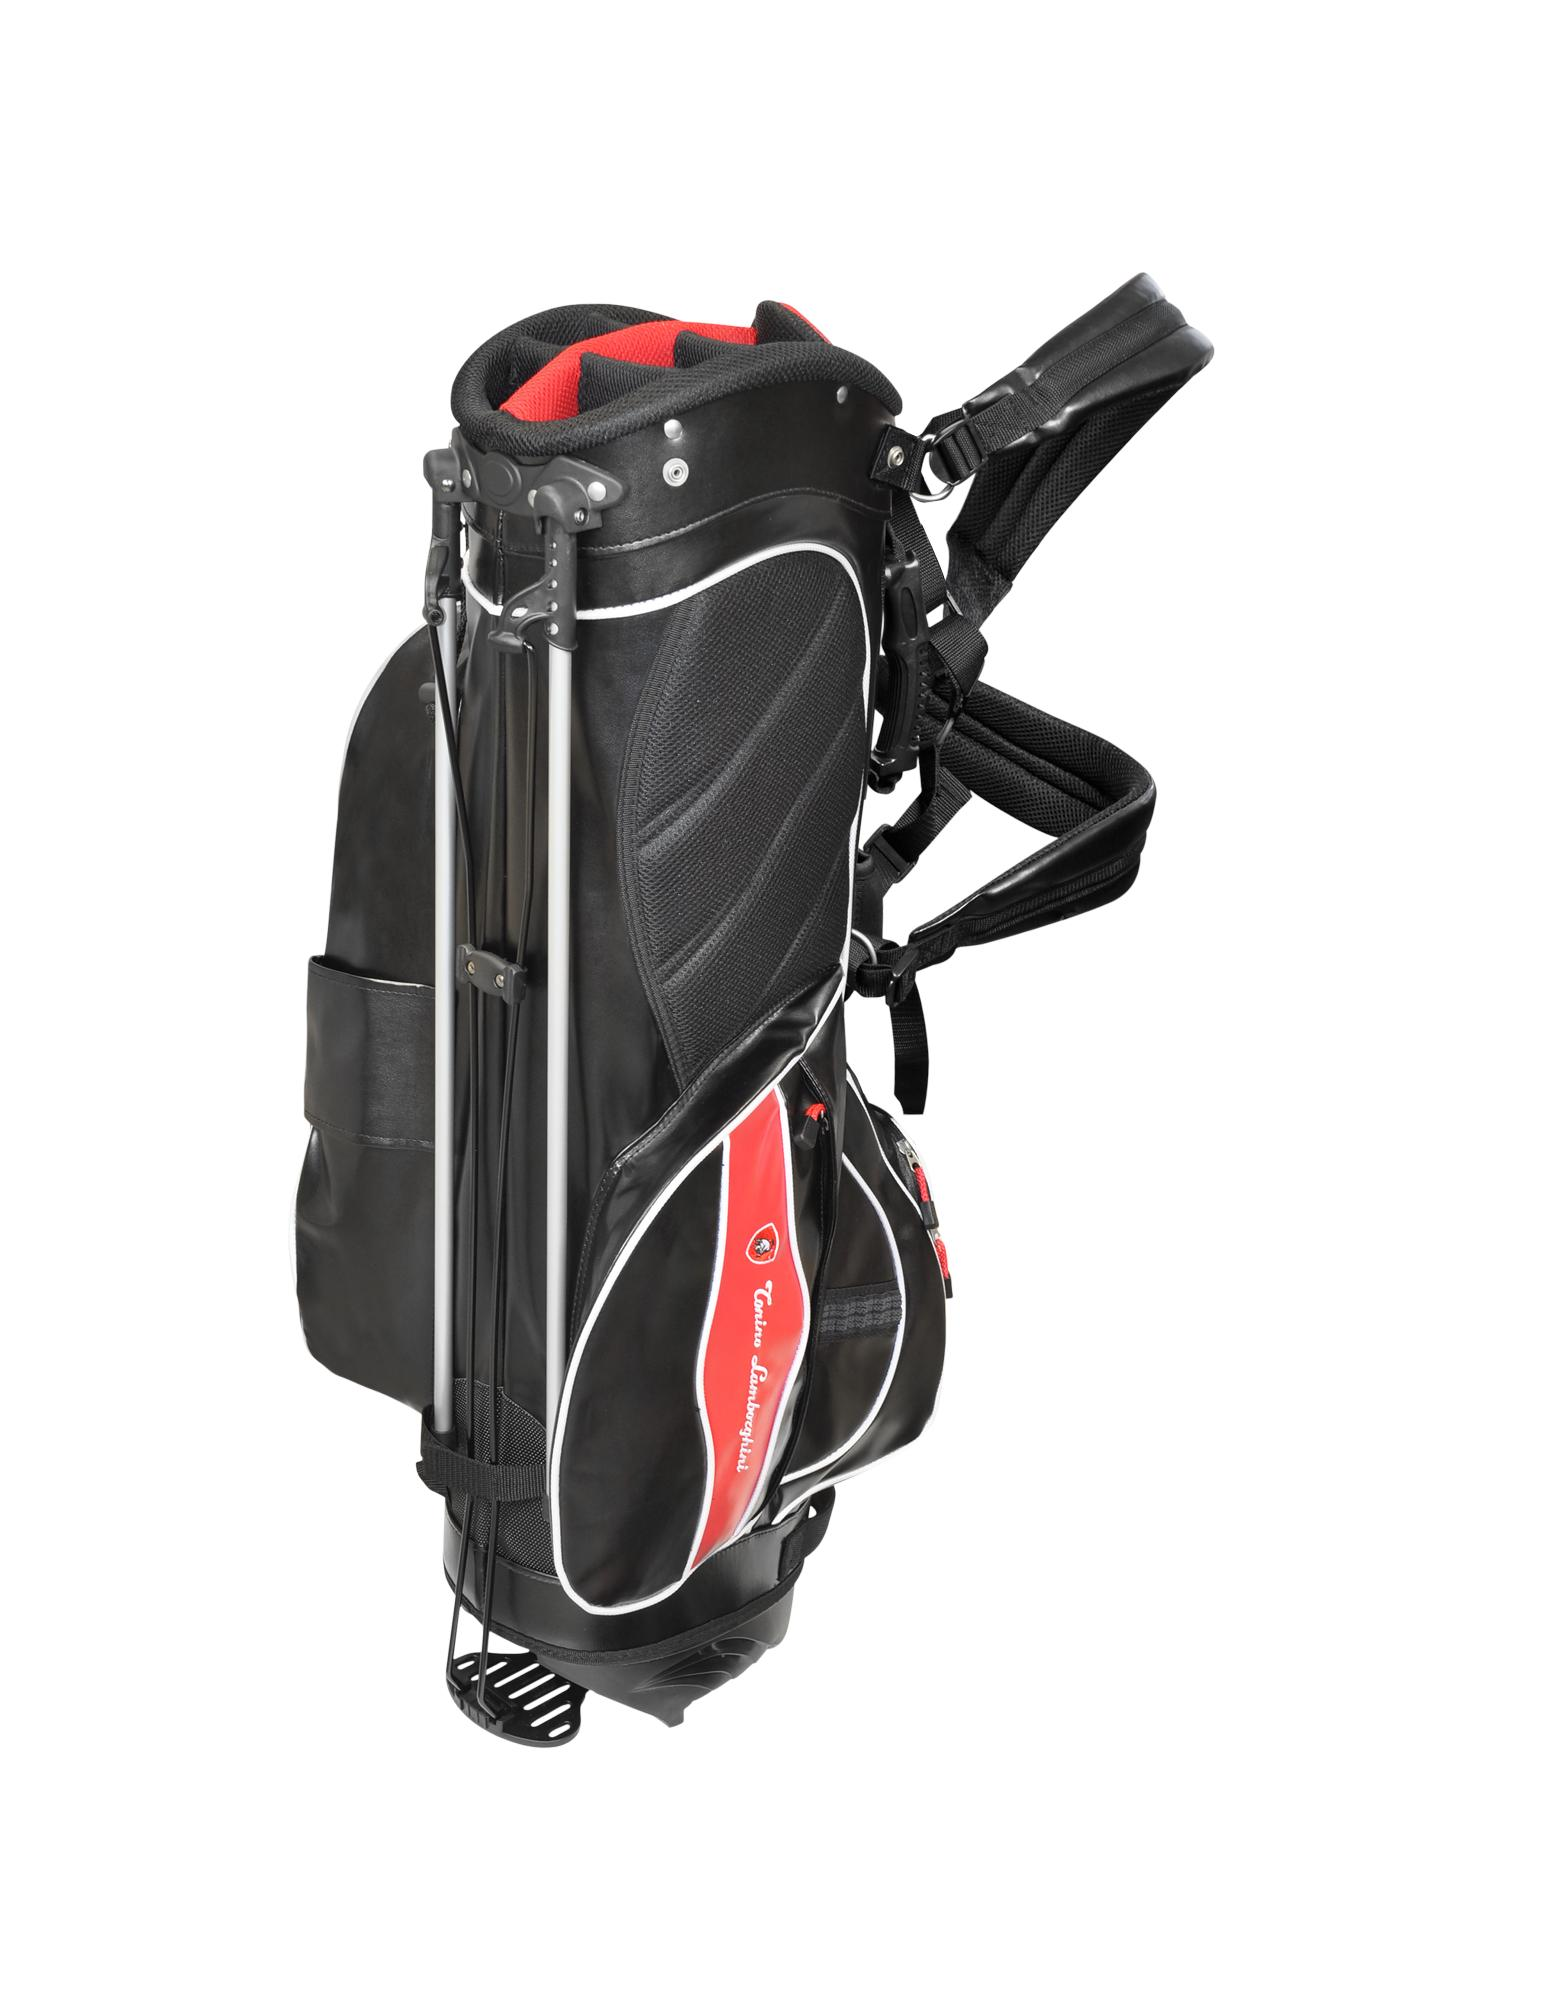 Tonino Lamborghini  Golf Collection - Stand Bag 2